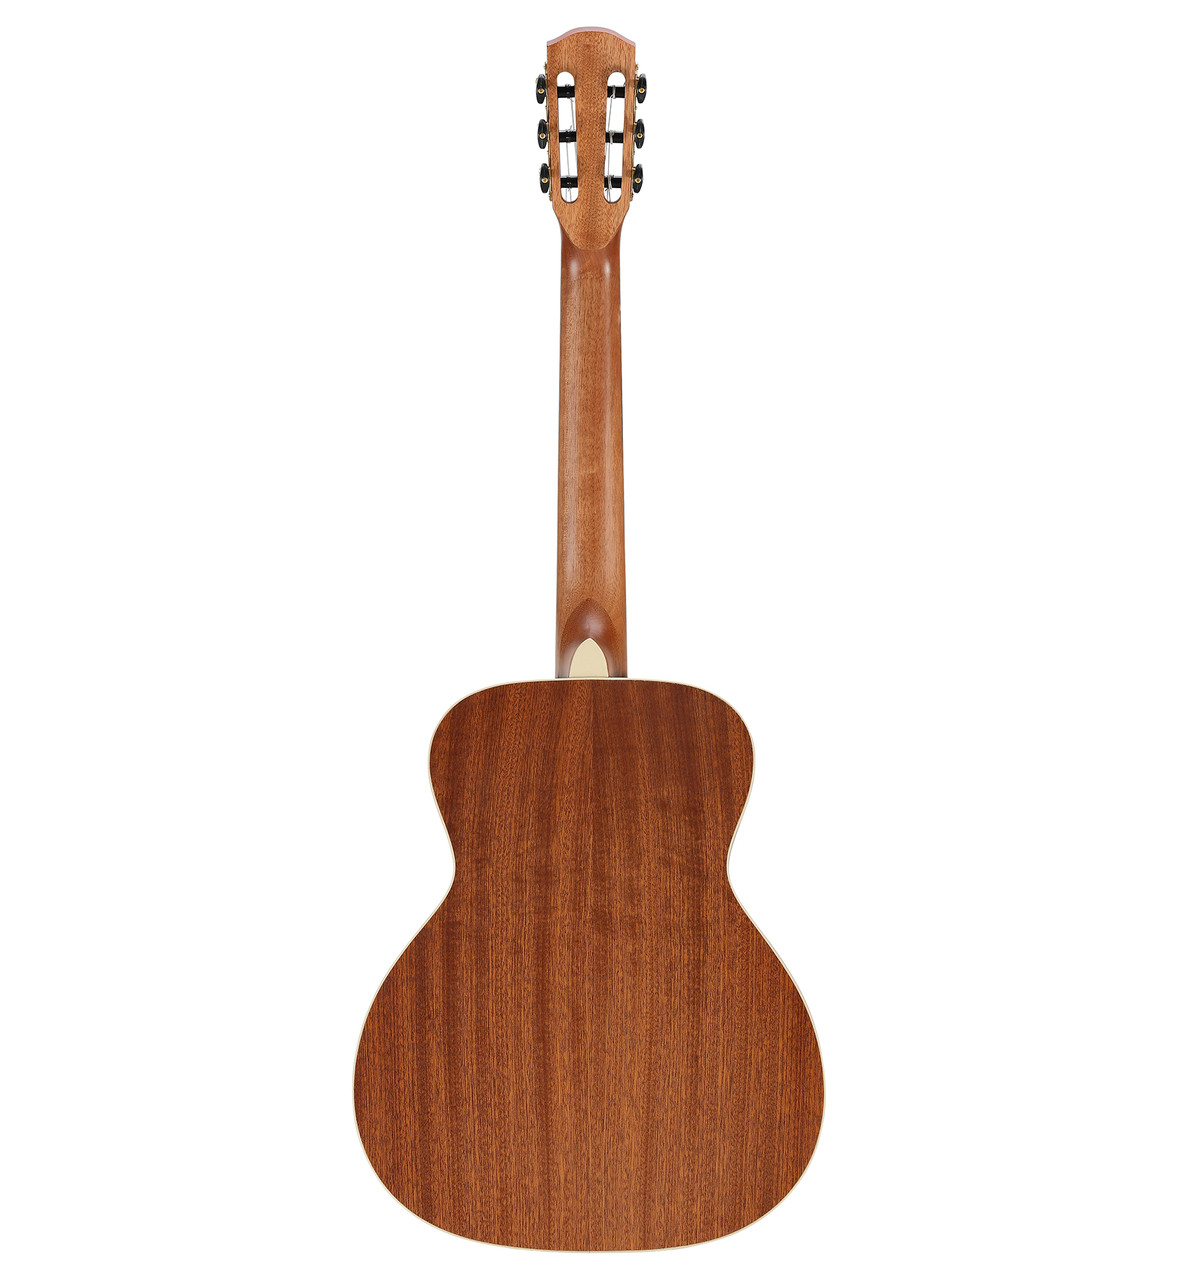 Alvarez RS26N School Series Steel String Short Scale Student Guitar